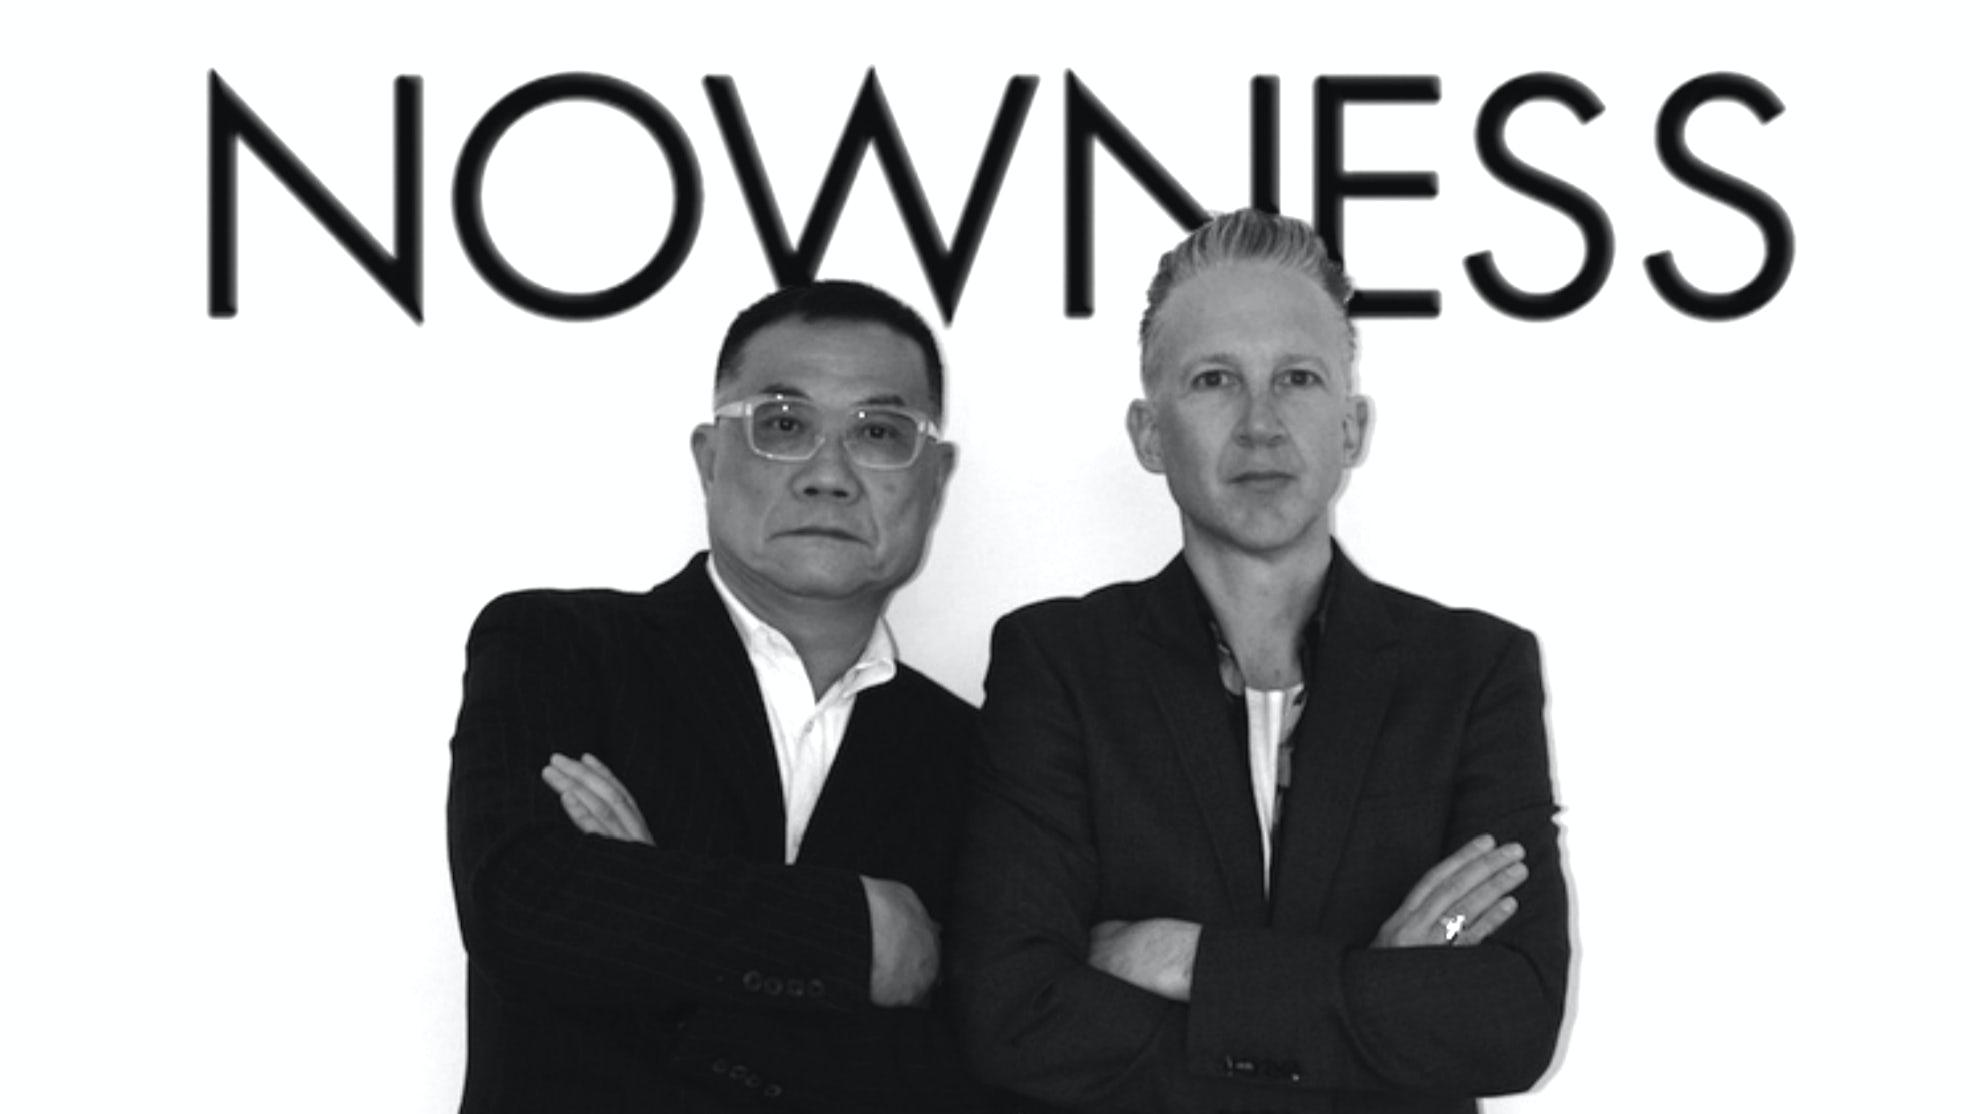 News Bites | Modern Dazed Acquires Nowness Stake, Kérastase On-Demand, Elie Top Online